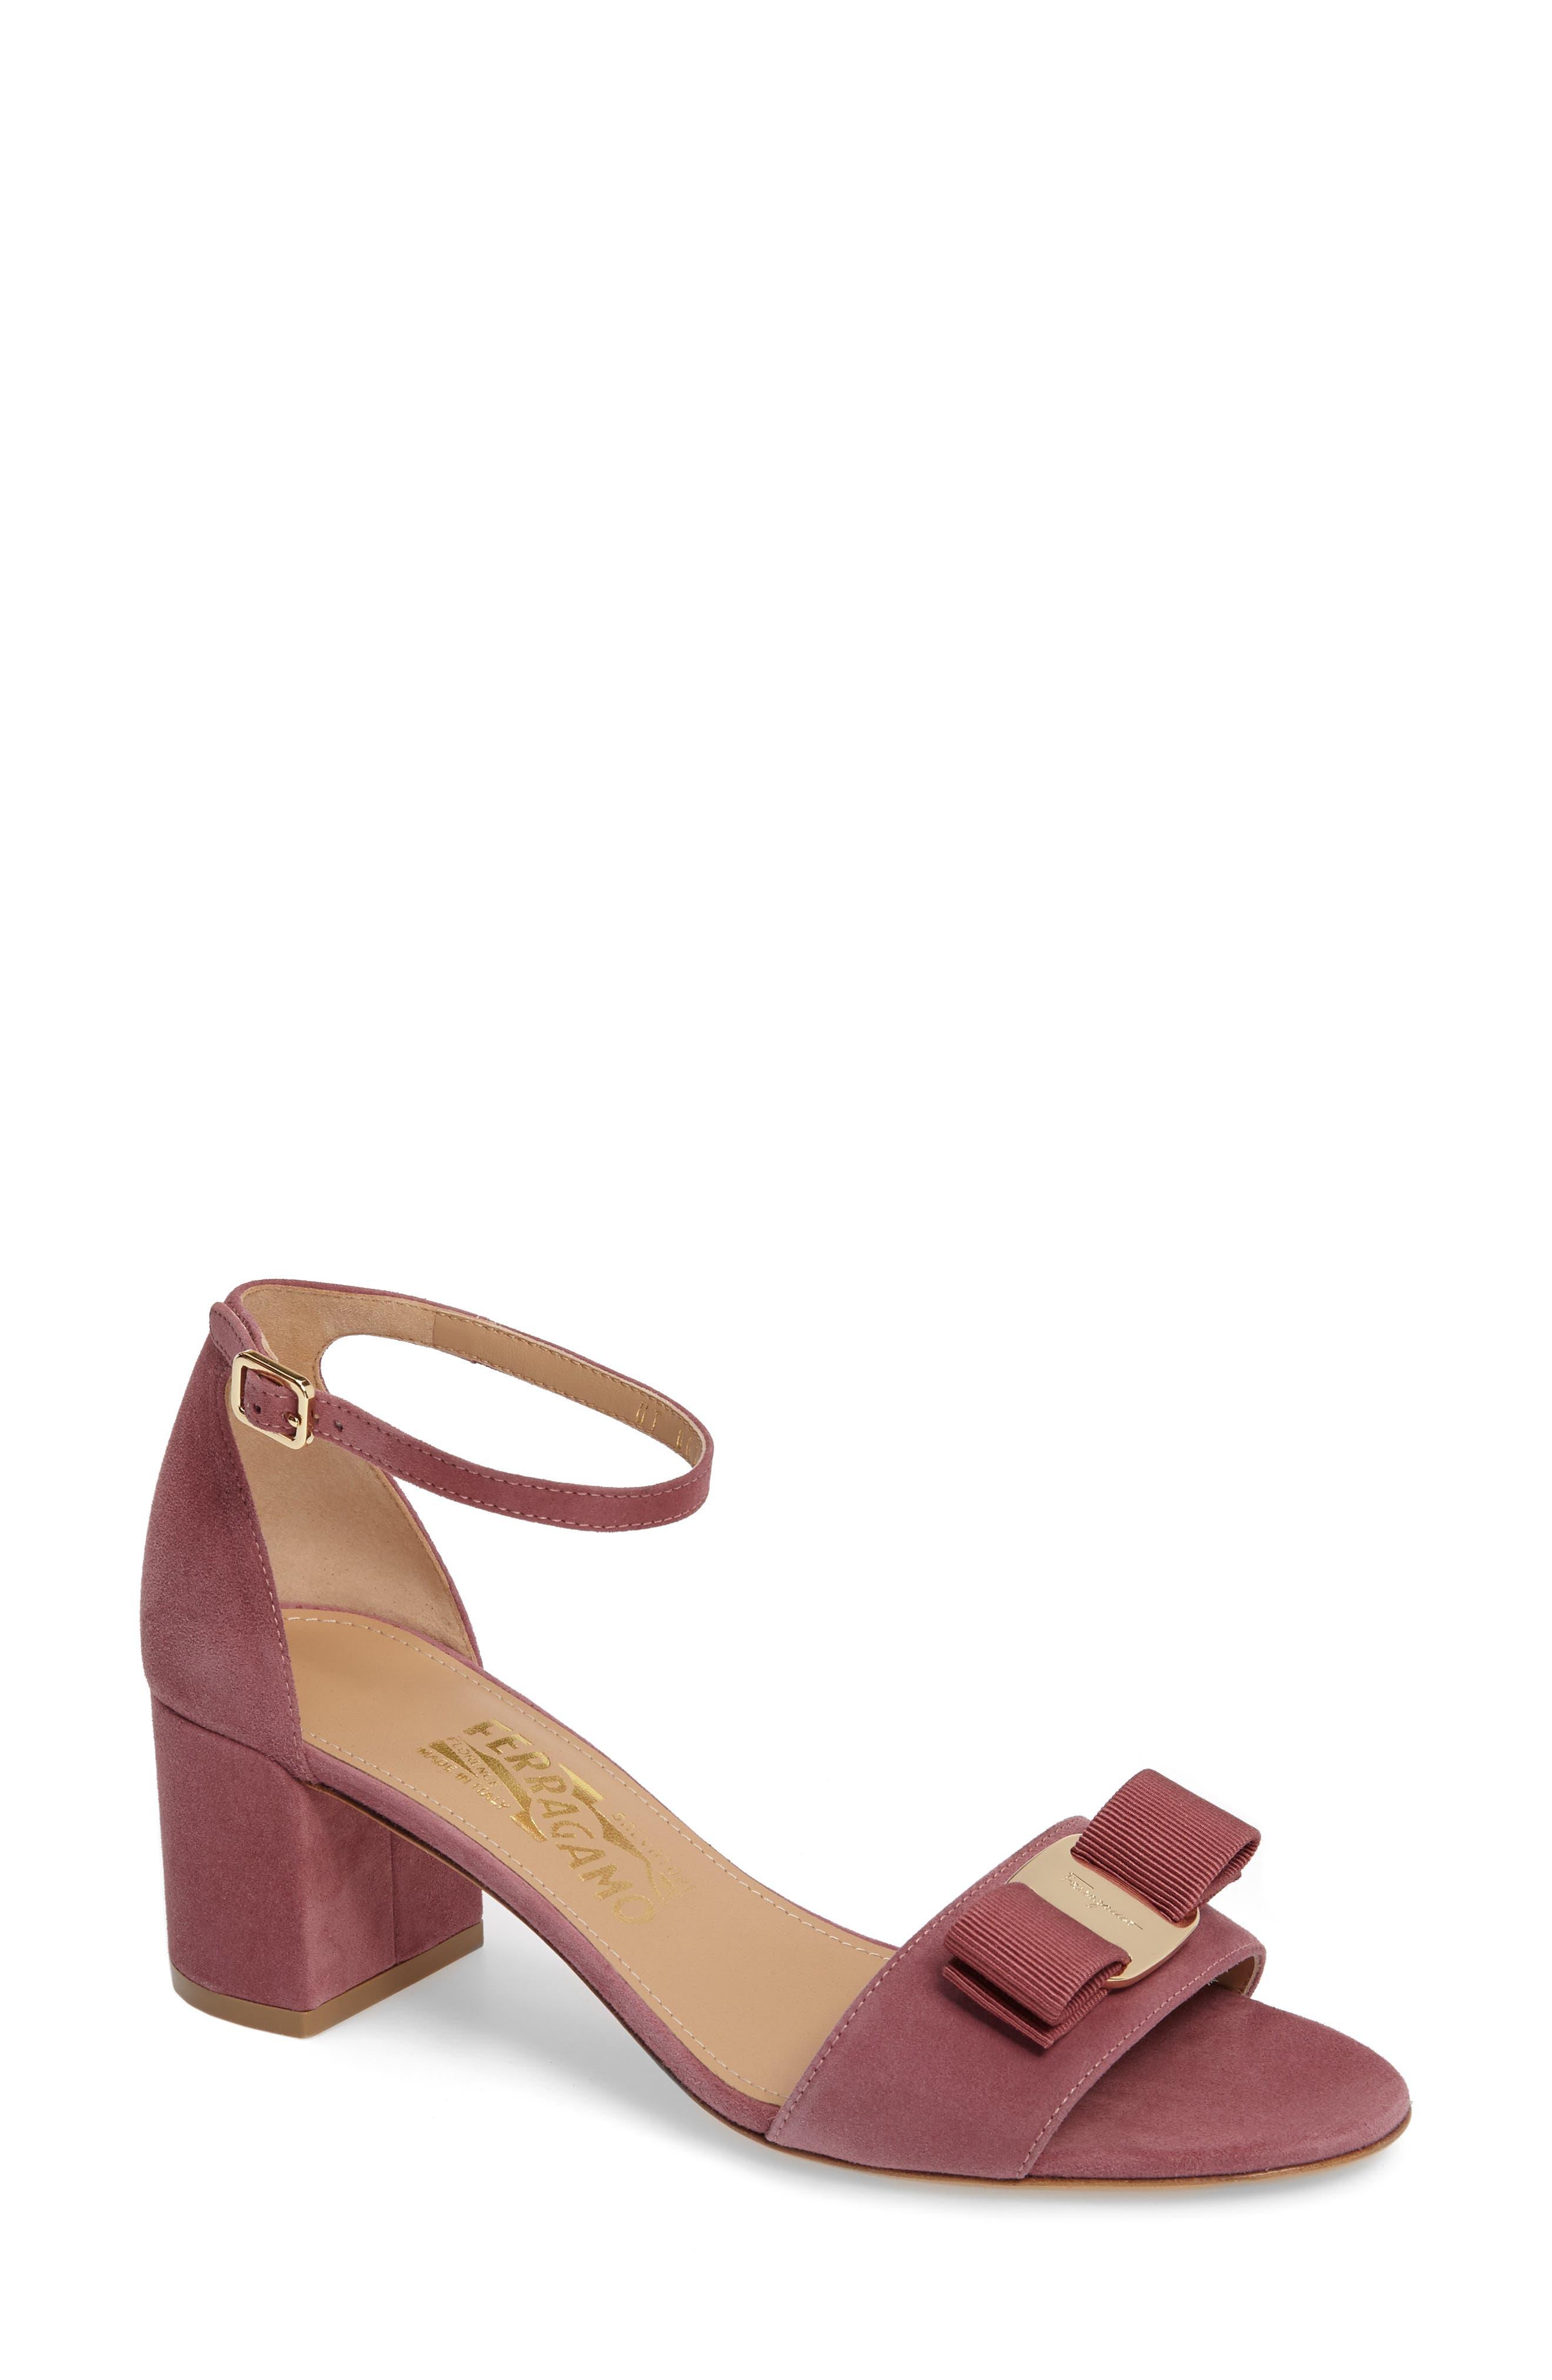 Main Image - Salvatore Ferragamo Block Heel Bow Sandal (Women)